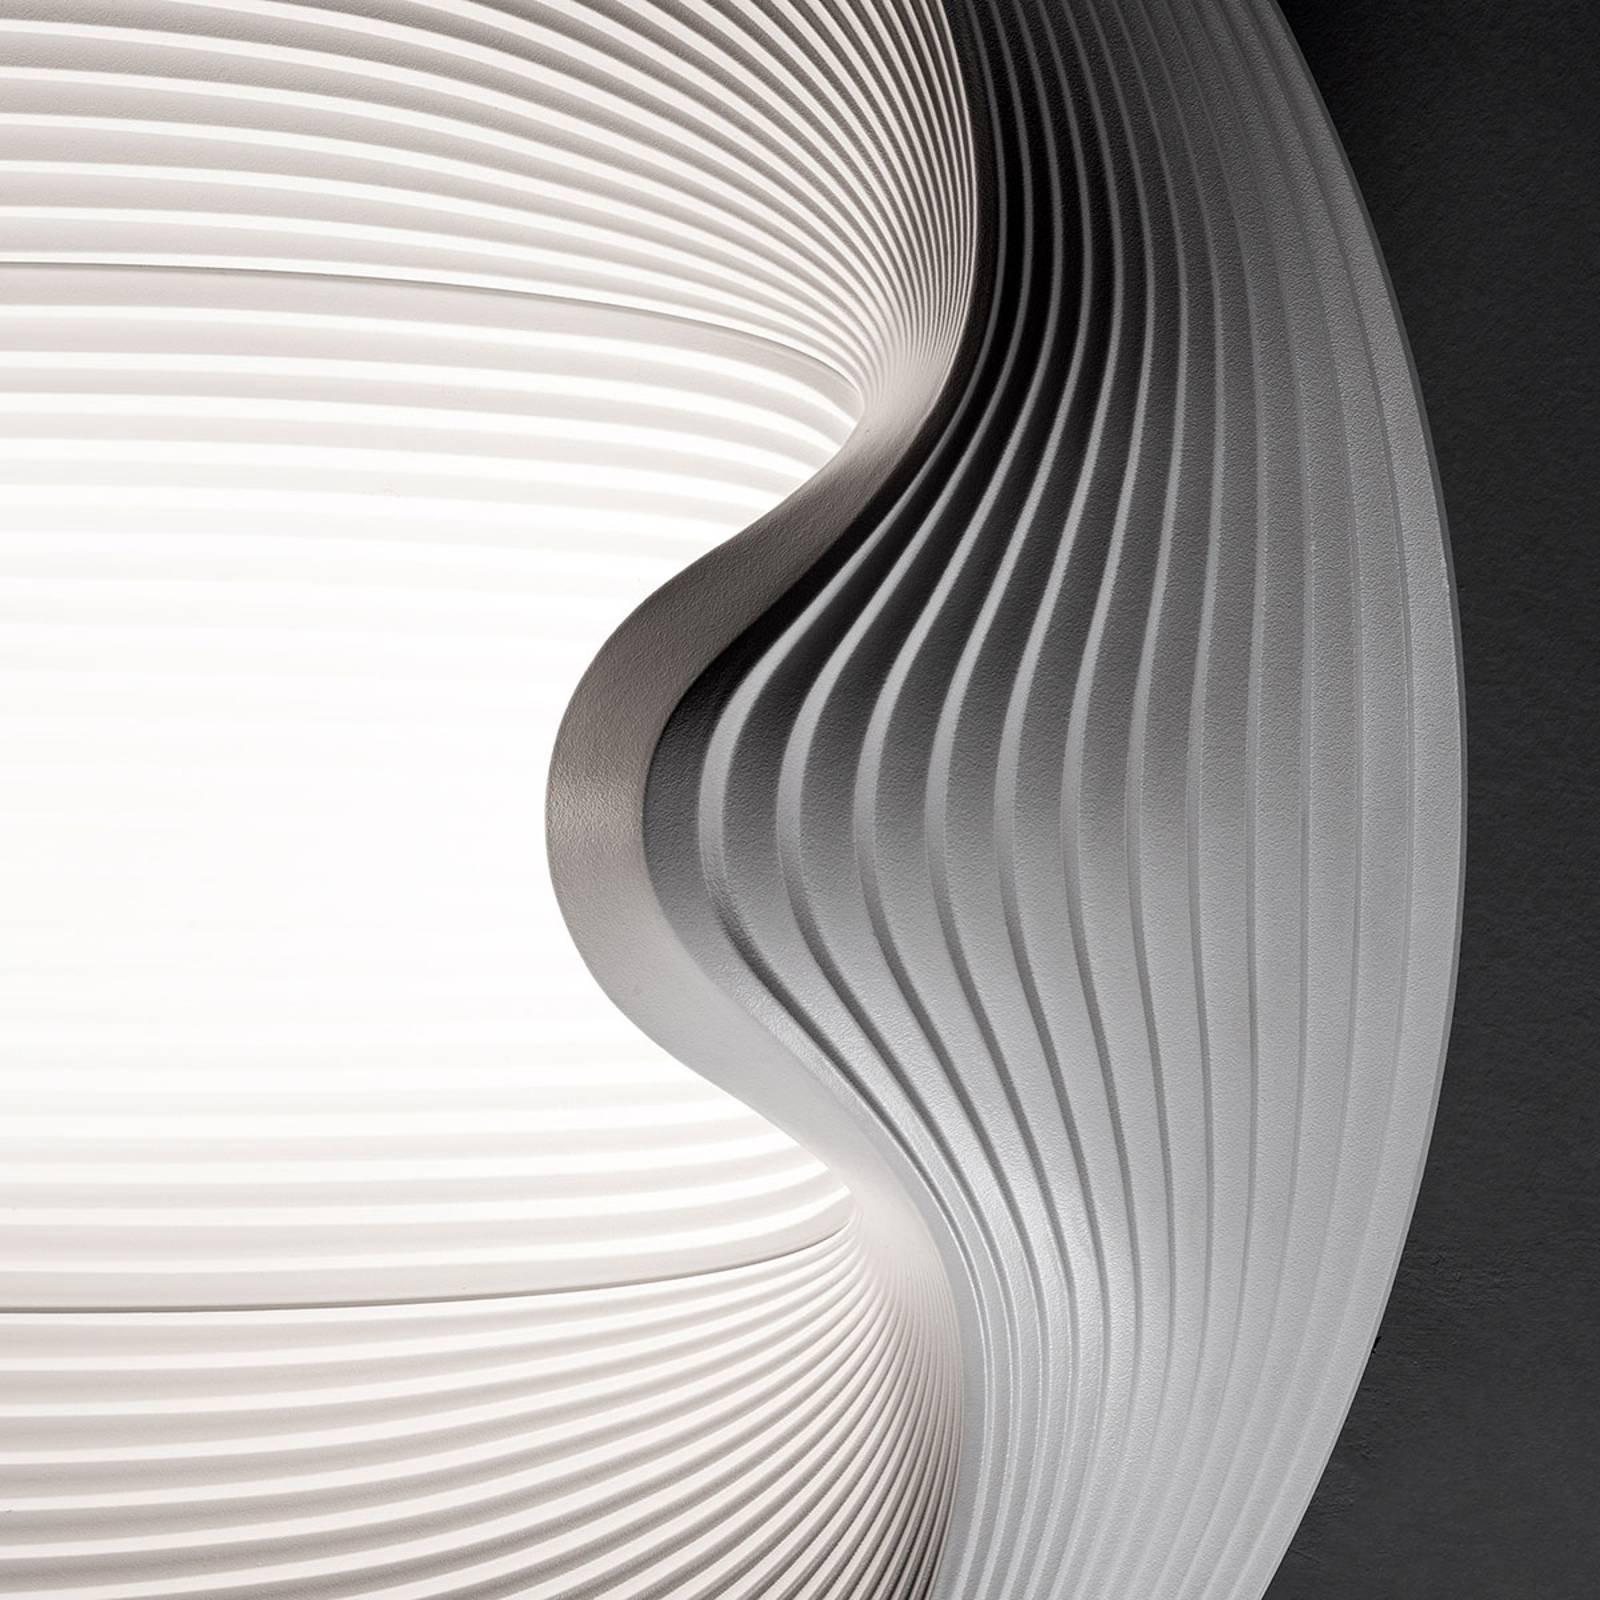 Cini&Nils Sestessa LED-taklampe, Casambi-kompatib.